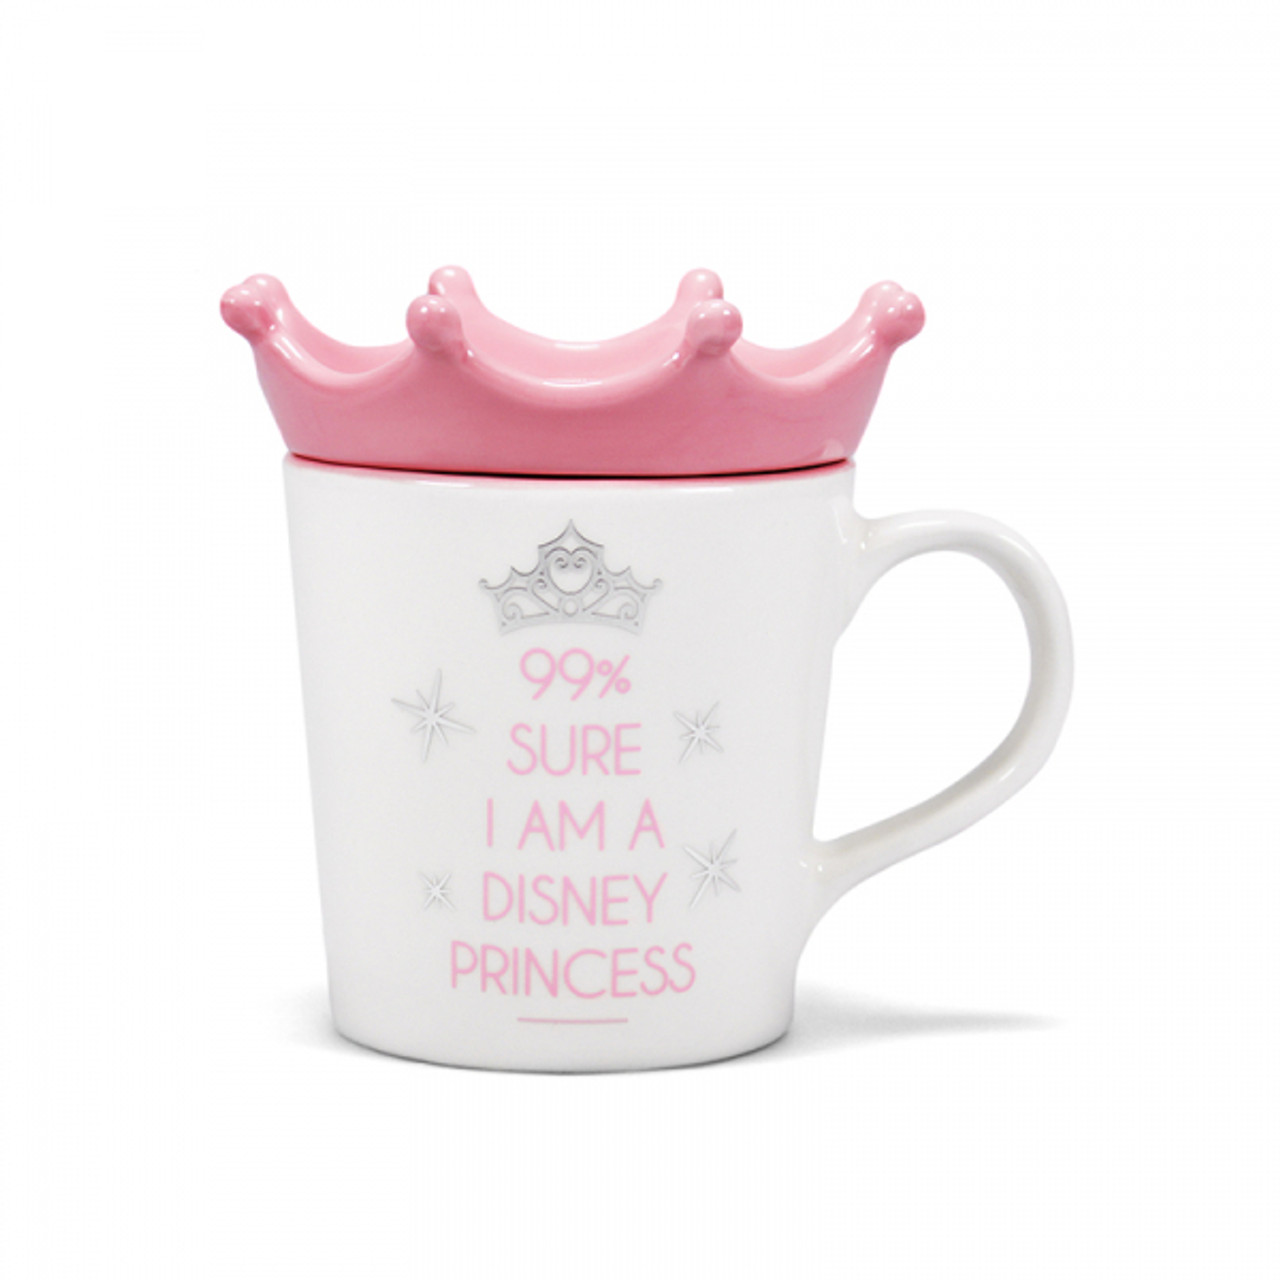 Disney Princess Crown Coaster Lid Coffee Mug